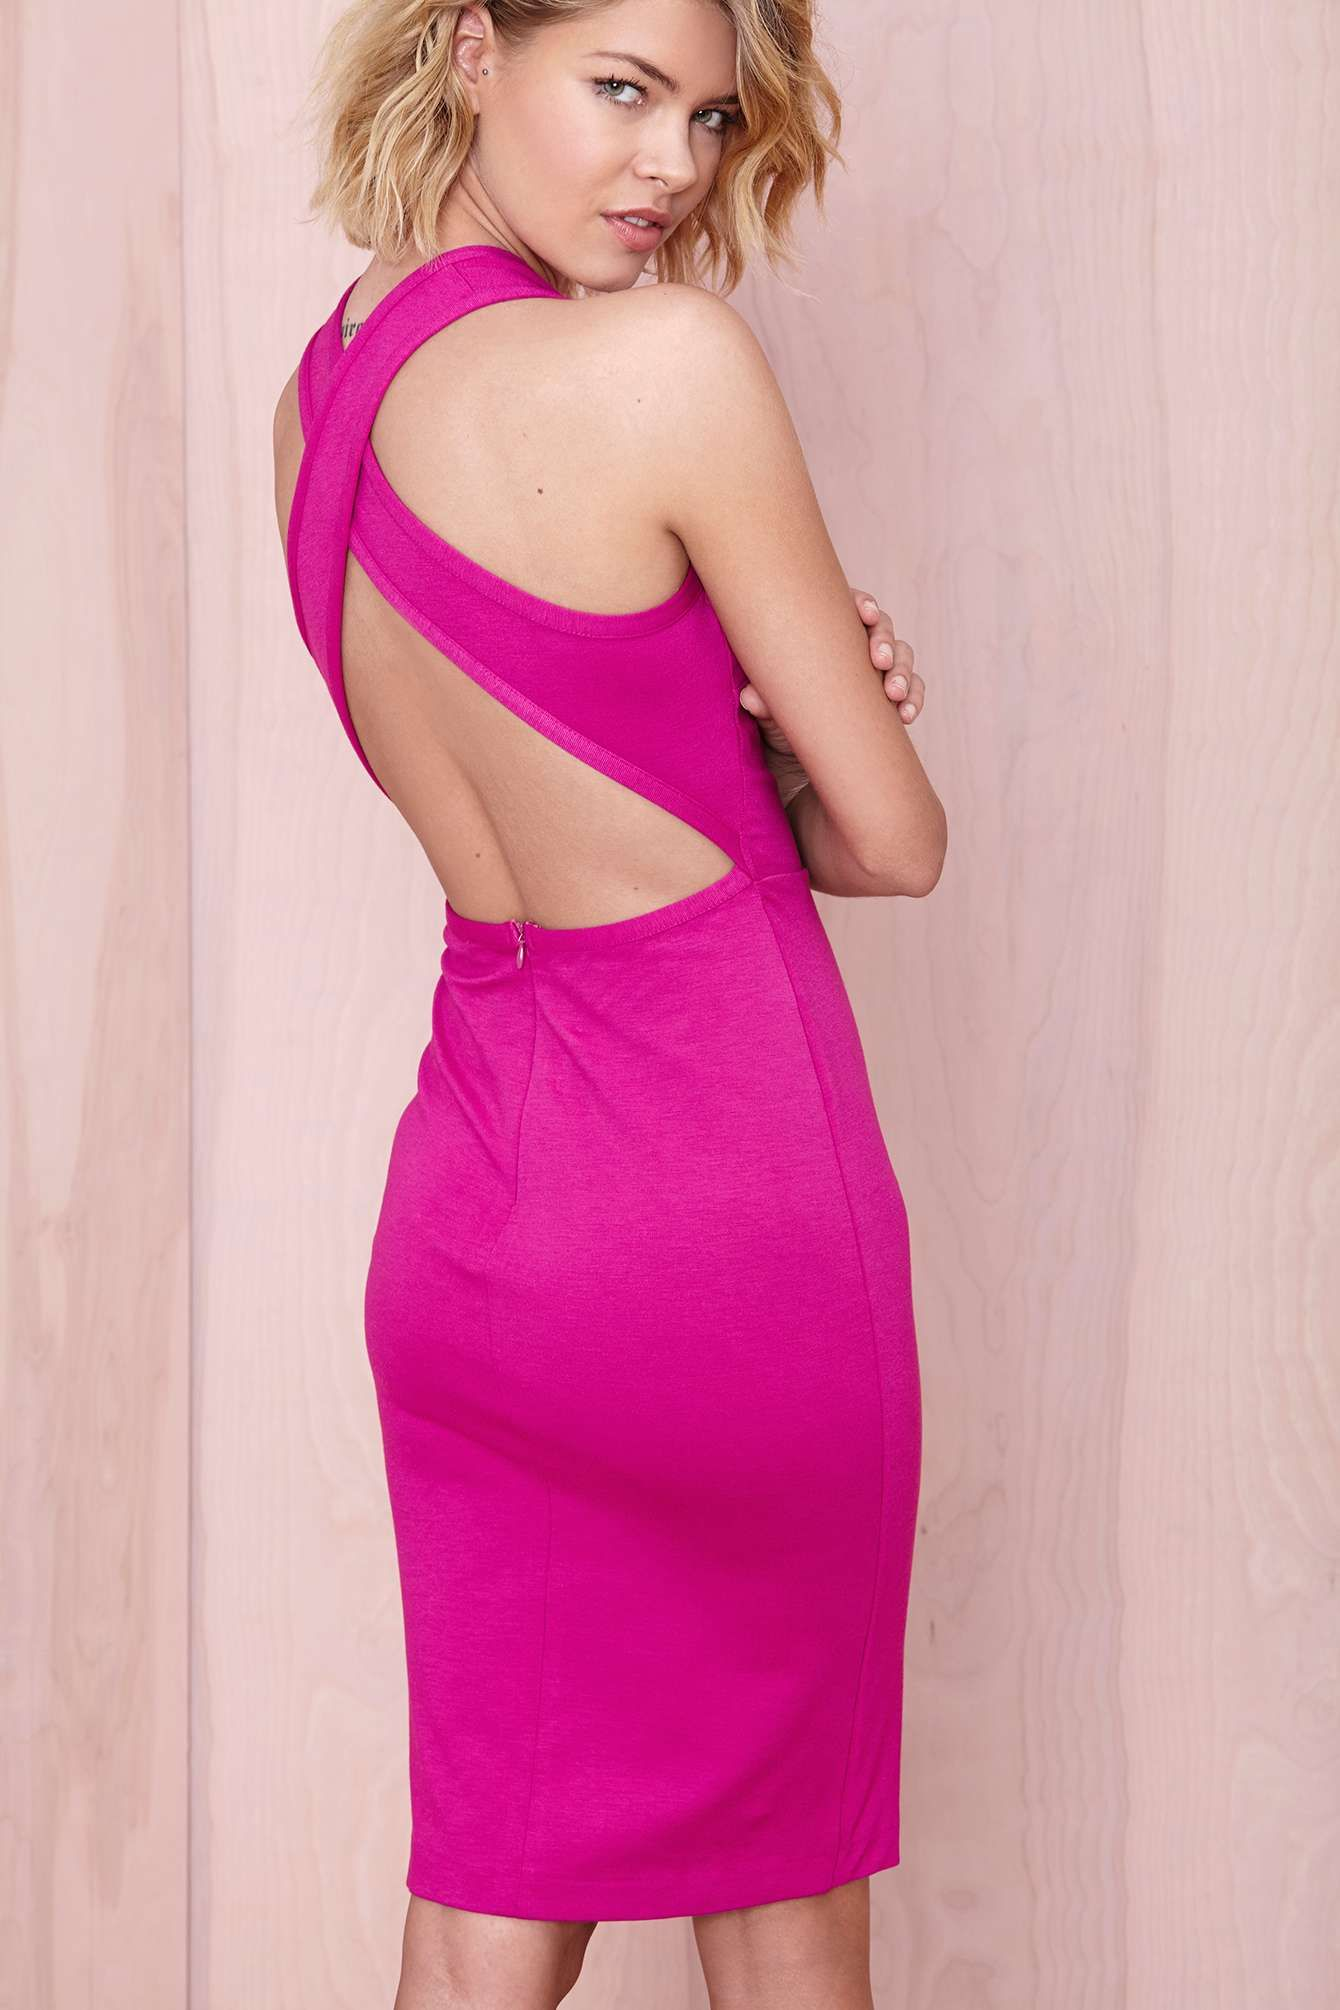 Faddoul Jasper Dress   Shop Clothes at Nasty Gal   clothes for Deb ...